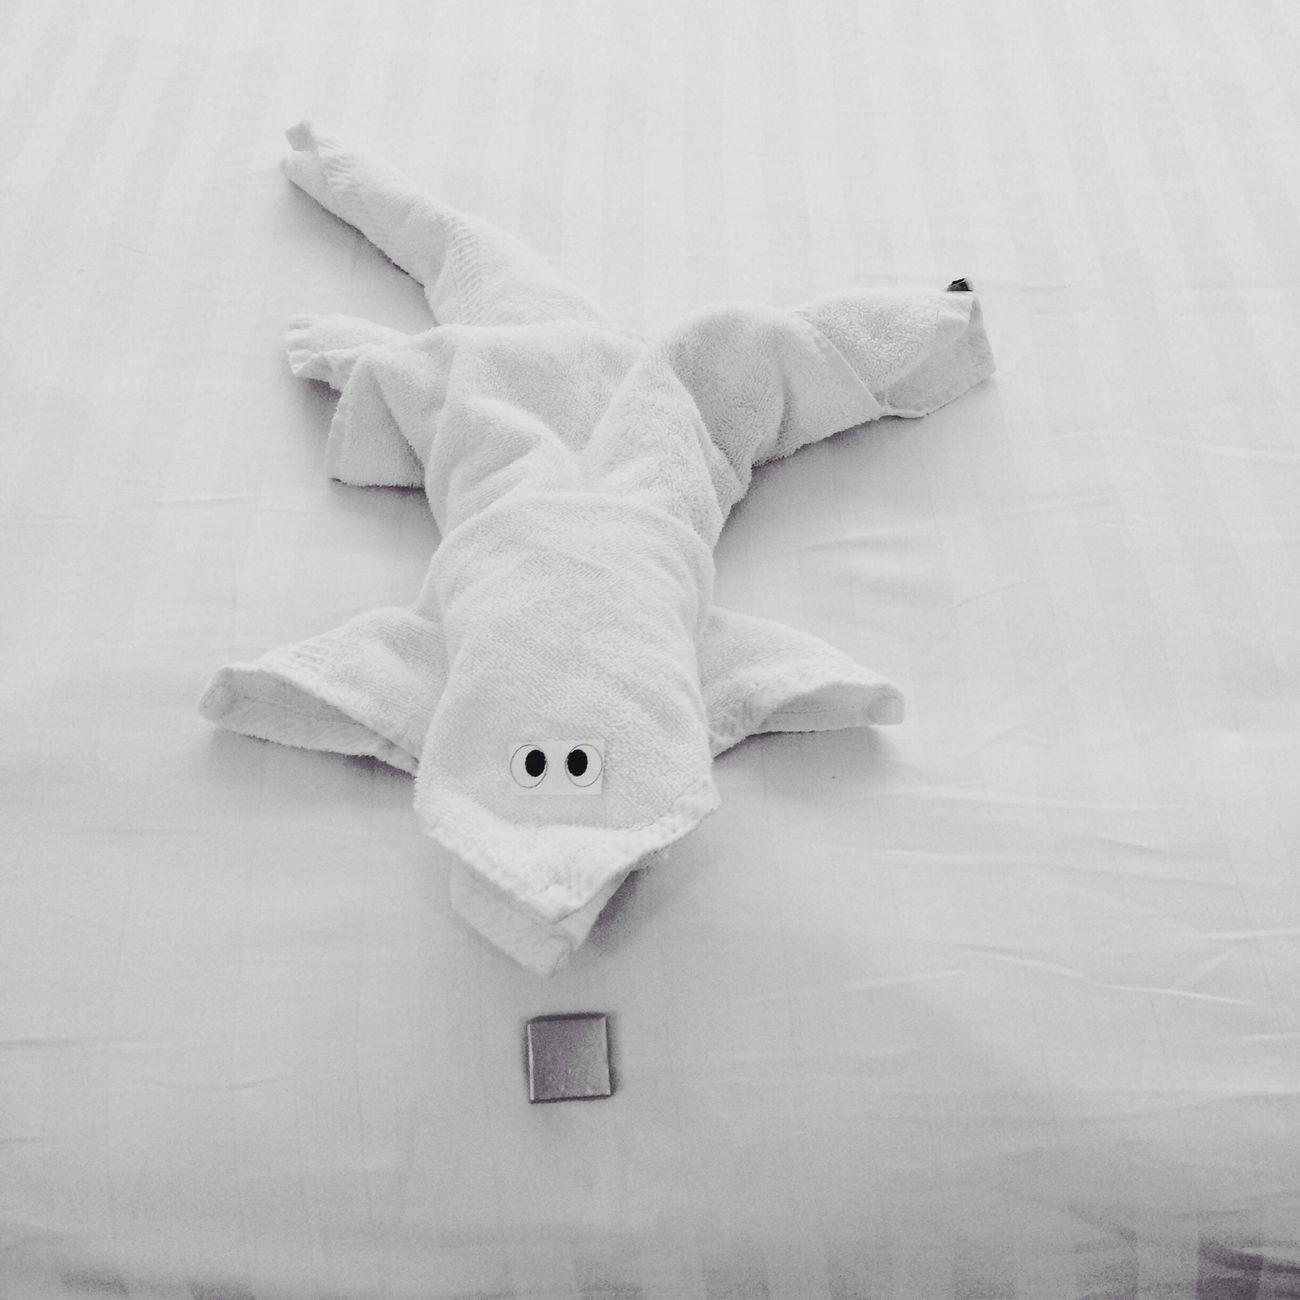 Blackandwhite Towel Animal Hotel Room Chocolate